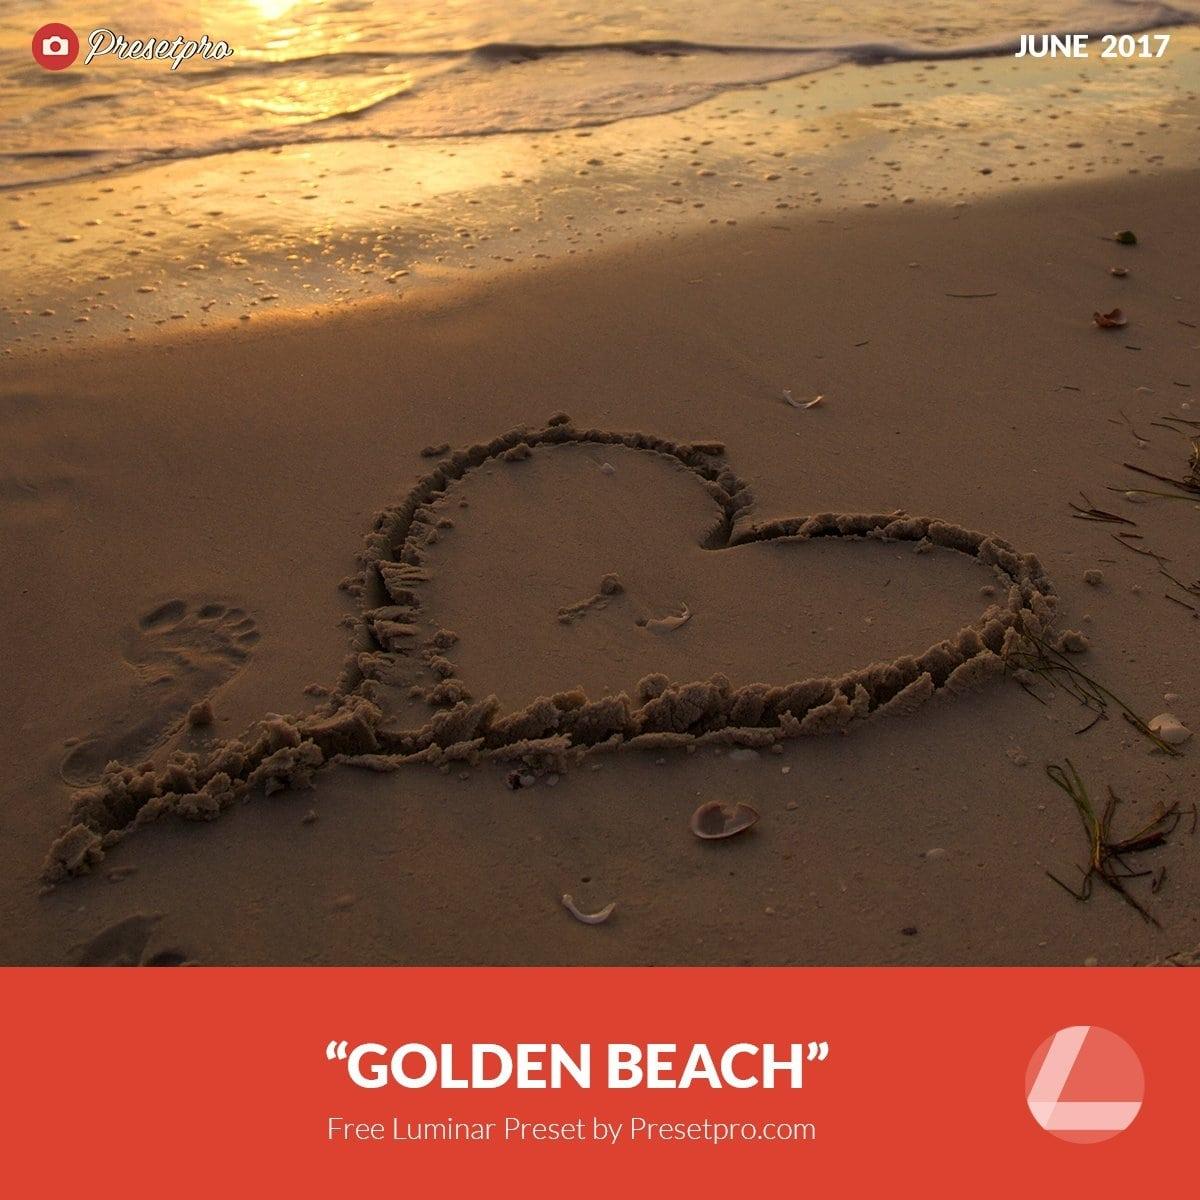 Free-Luminar-Preset-Golden-Beach-Presetpro.com